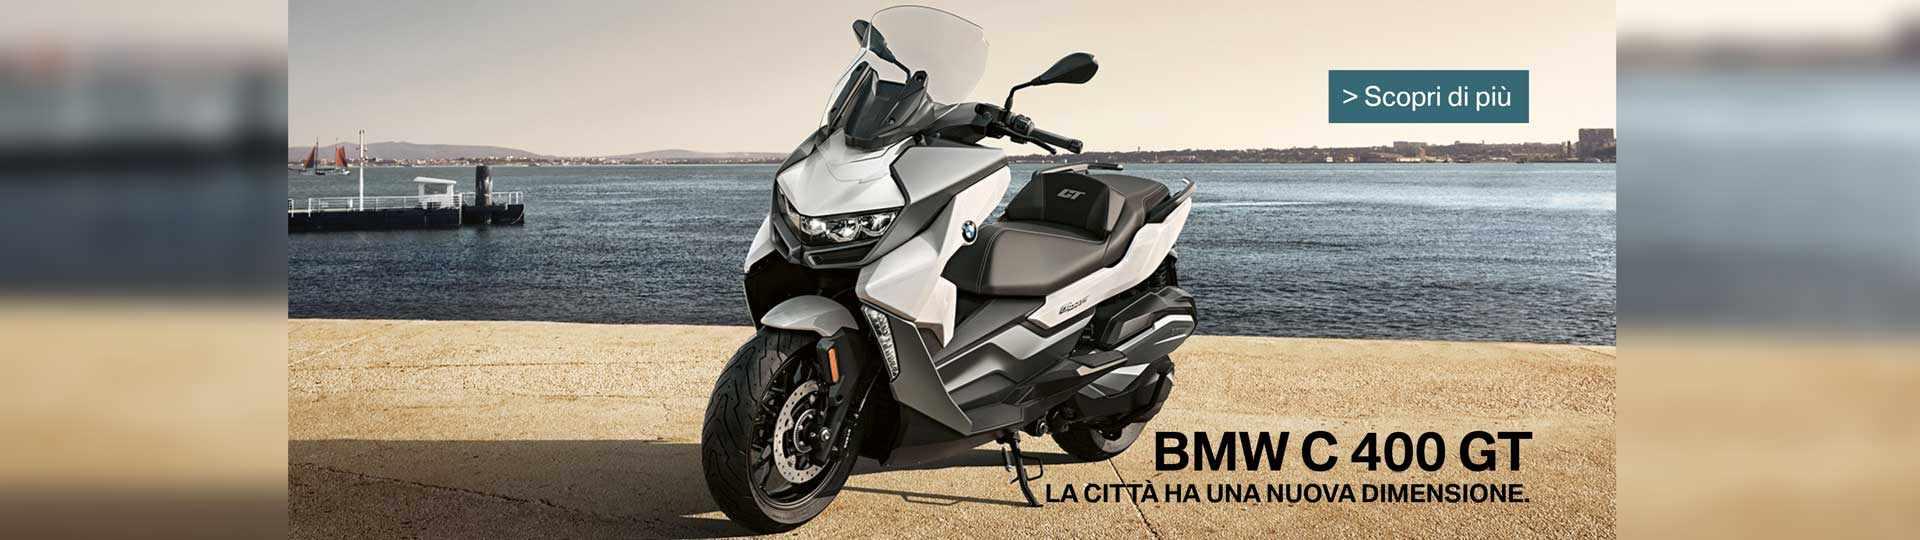 BMW-C-400-GT-min2.jpg